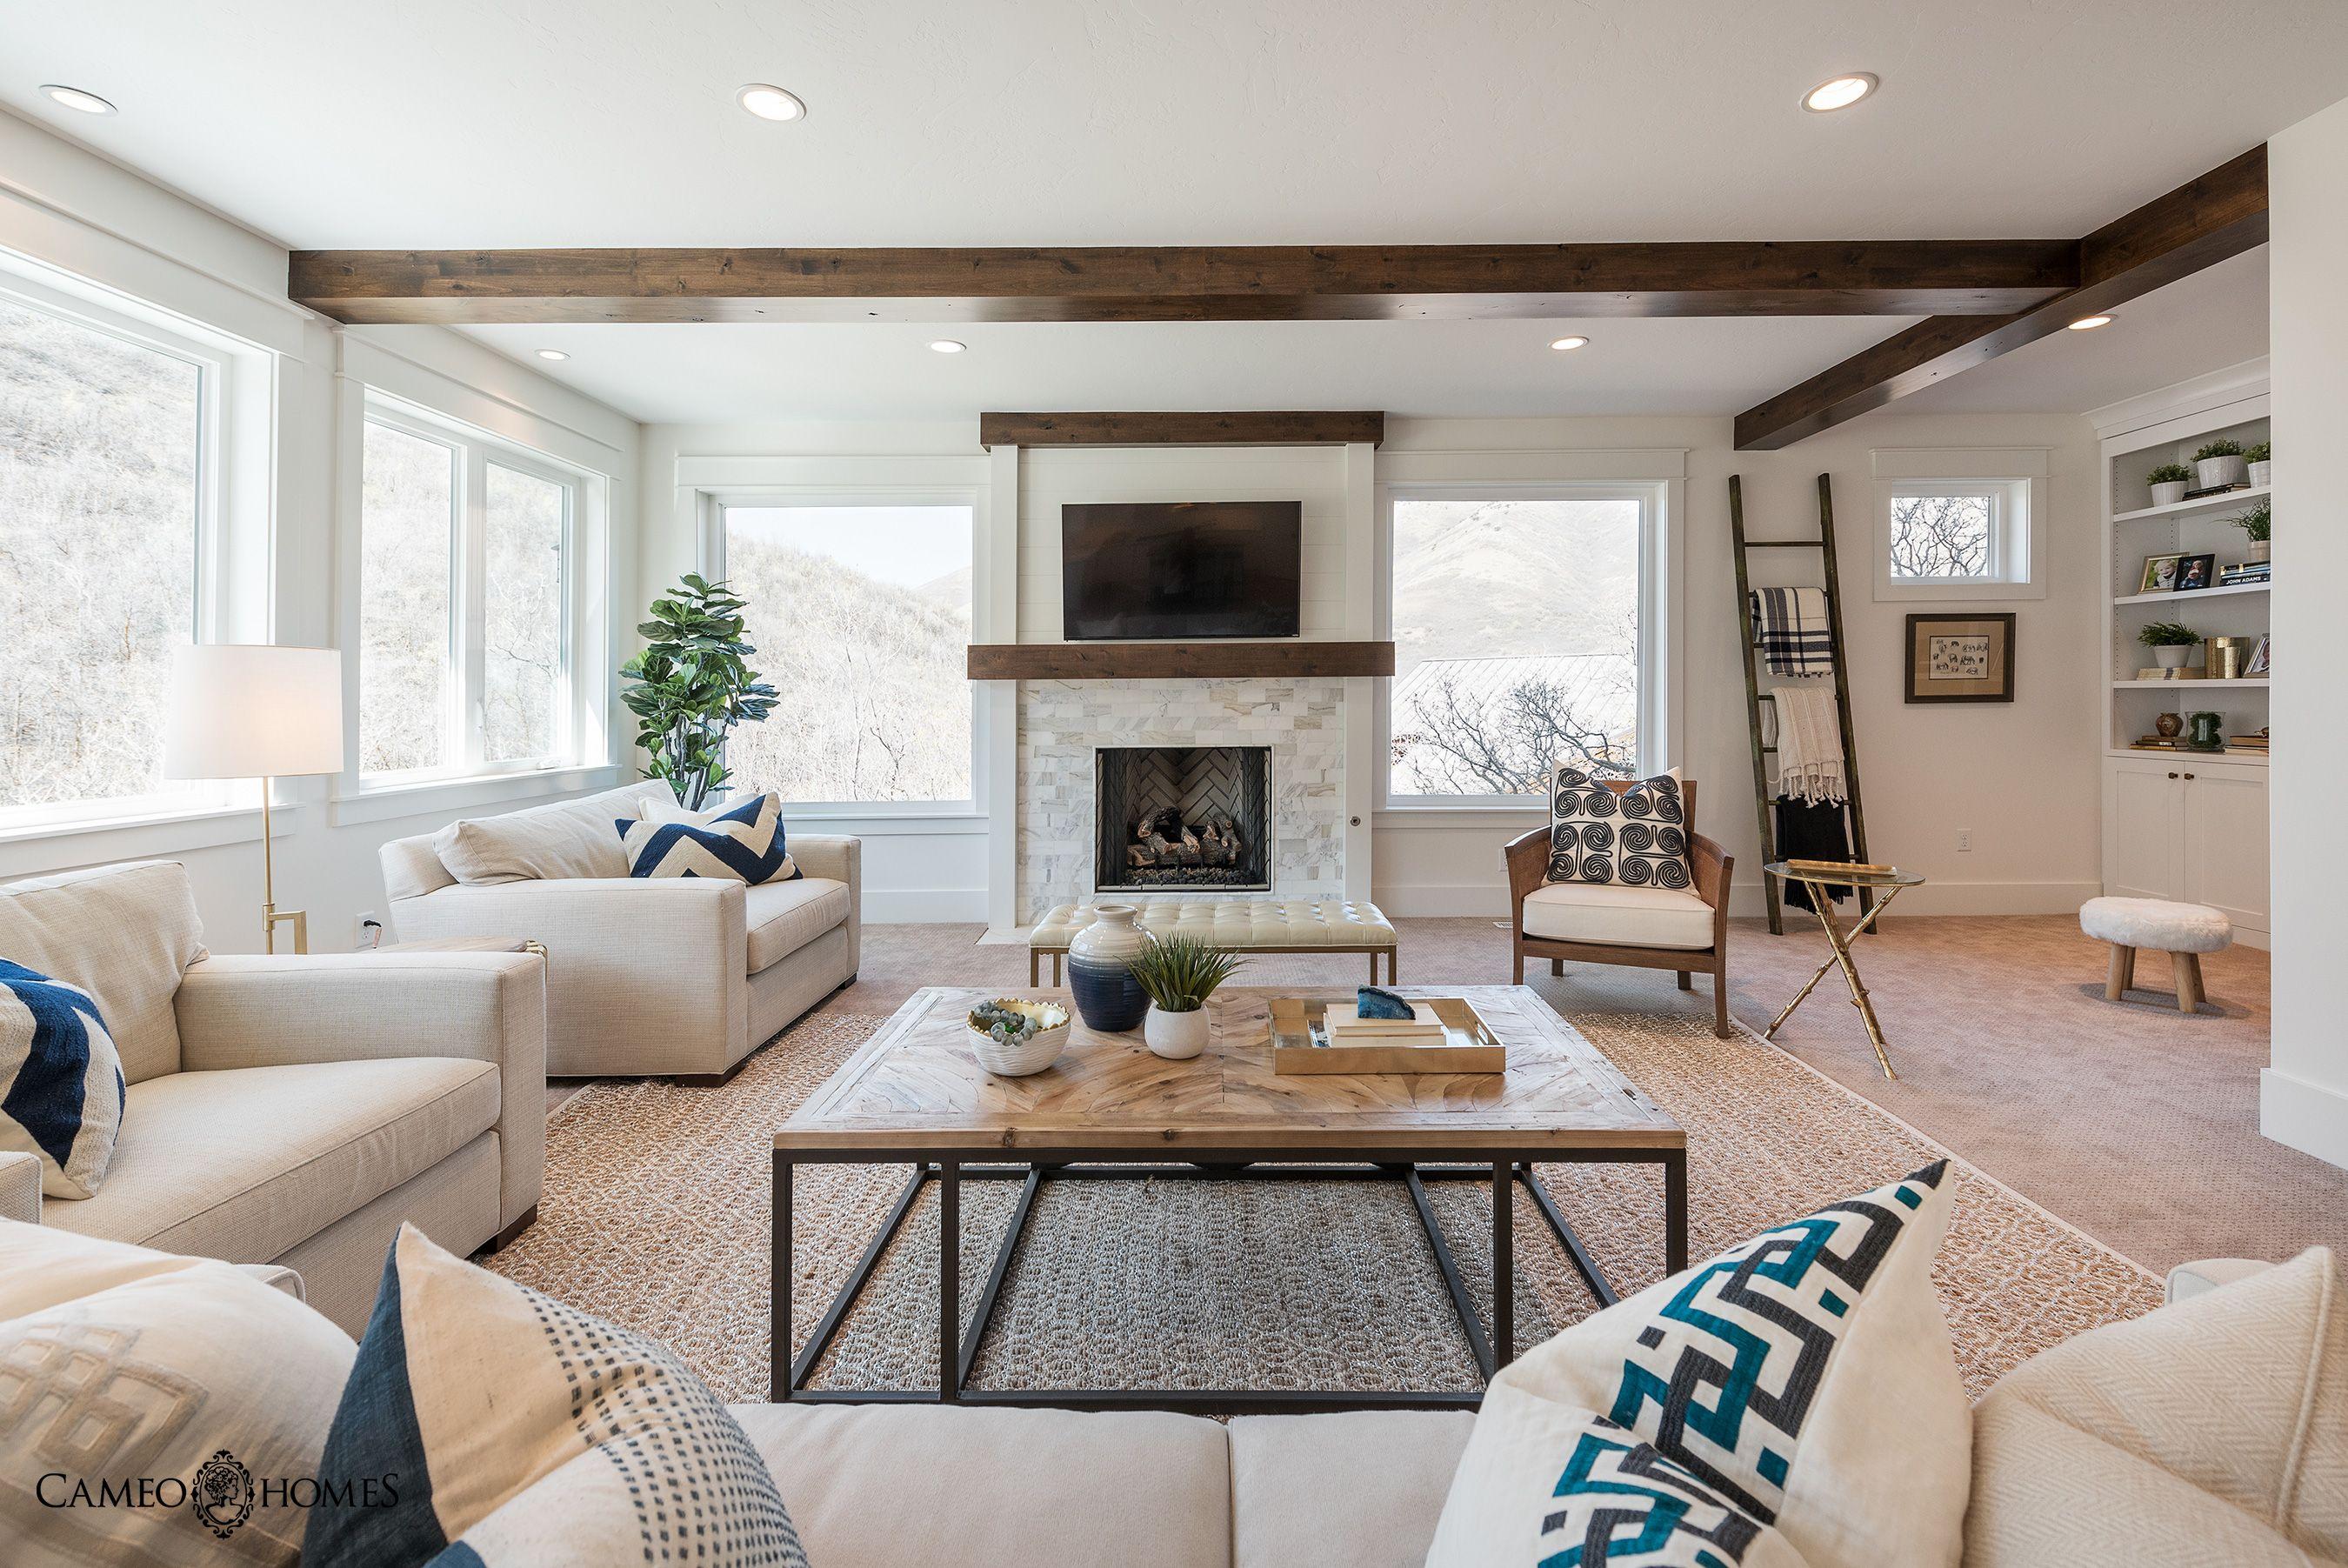 Sita Montgomery Interiors: Great Room Built By Cameo Homes Inc. In Utah. Interior